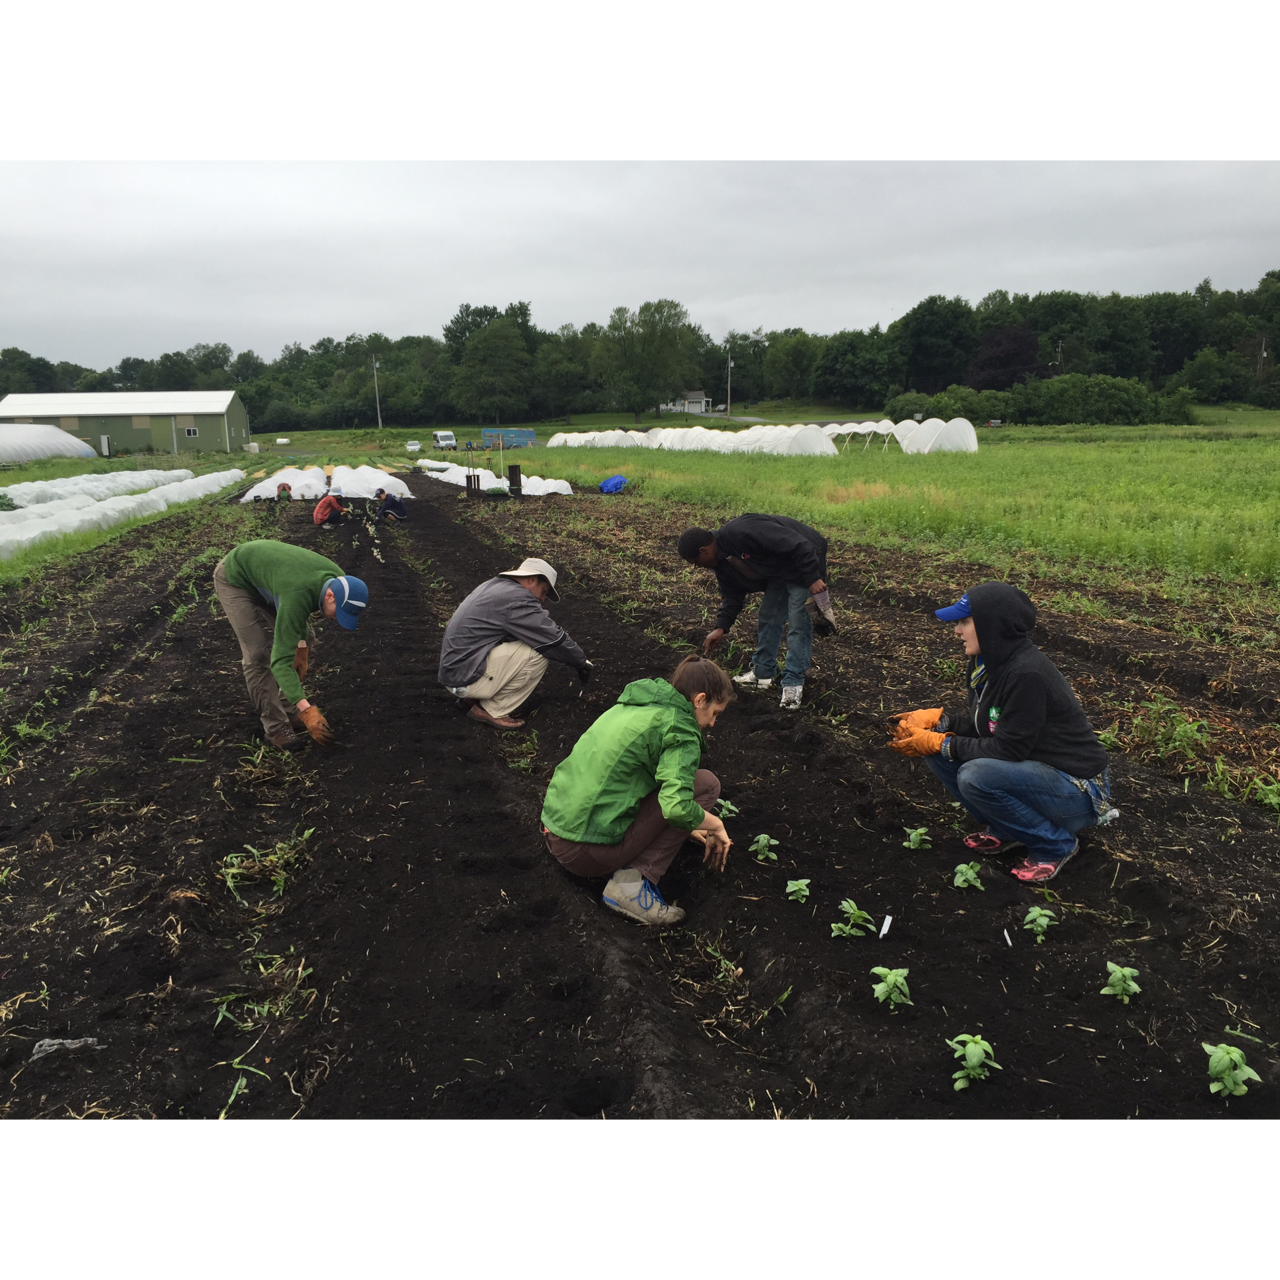 2015 growing soils - snug - Melissa Brzuszek 3.PNG